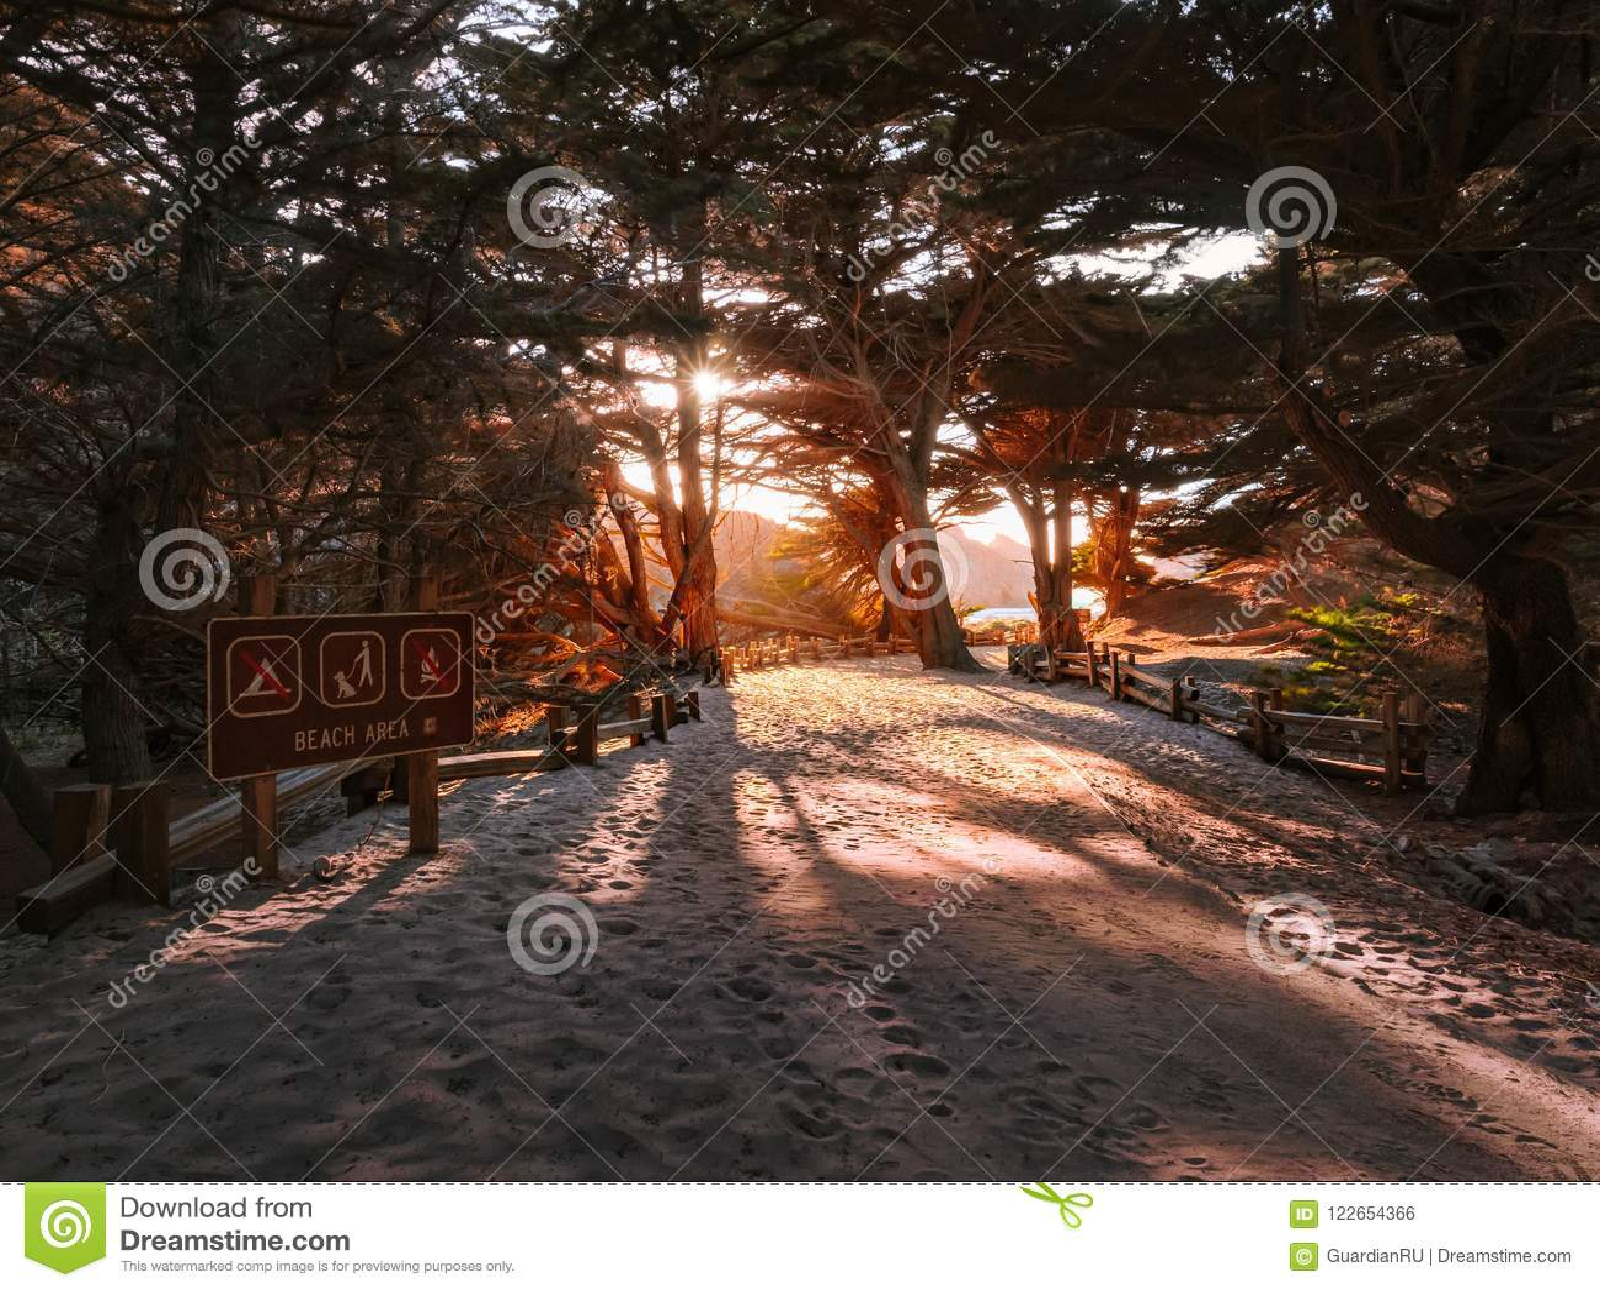 Beach entrance at Pfeiffer Big Sur State Park